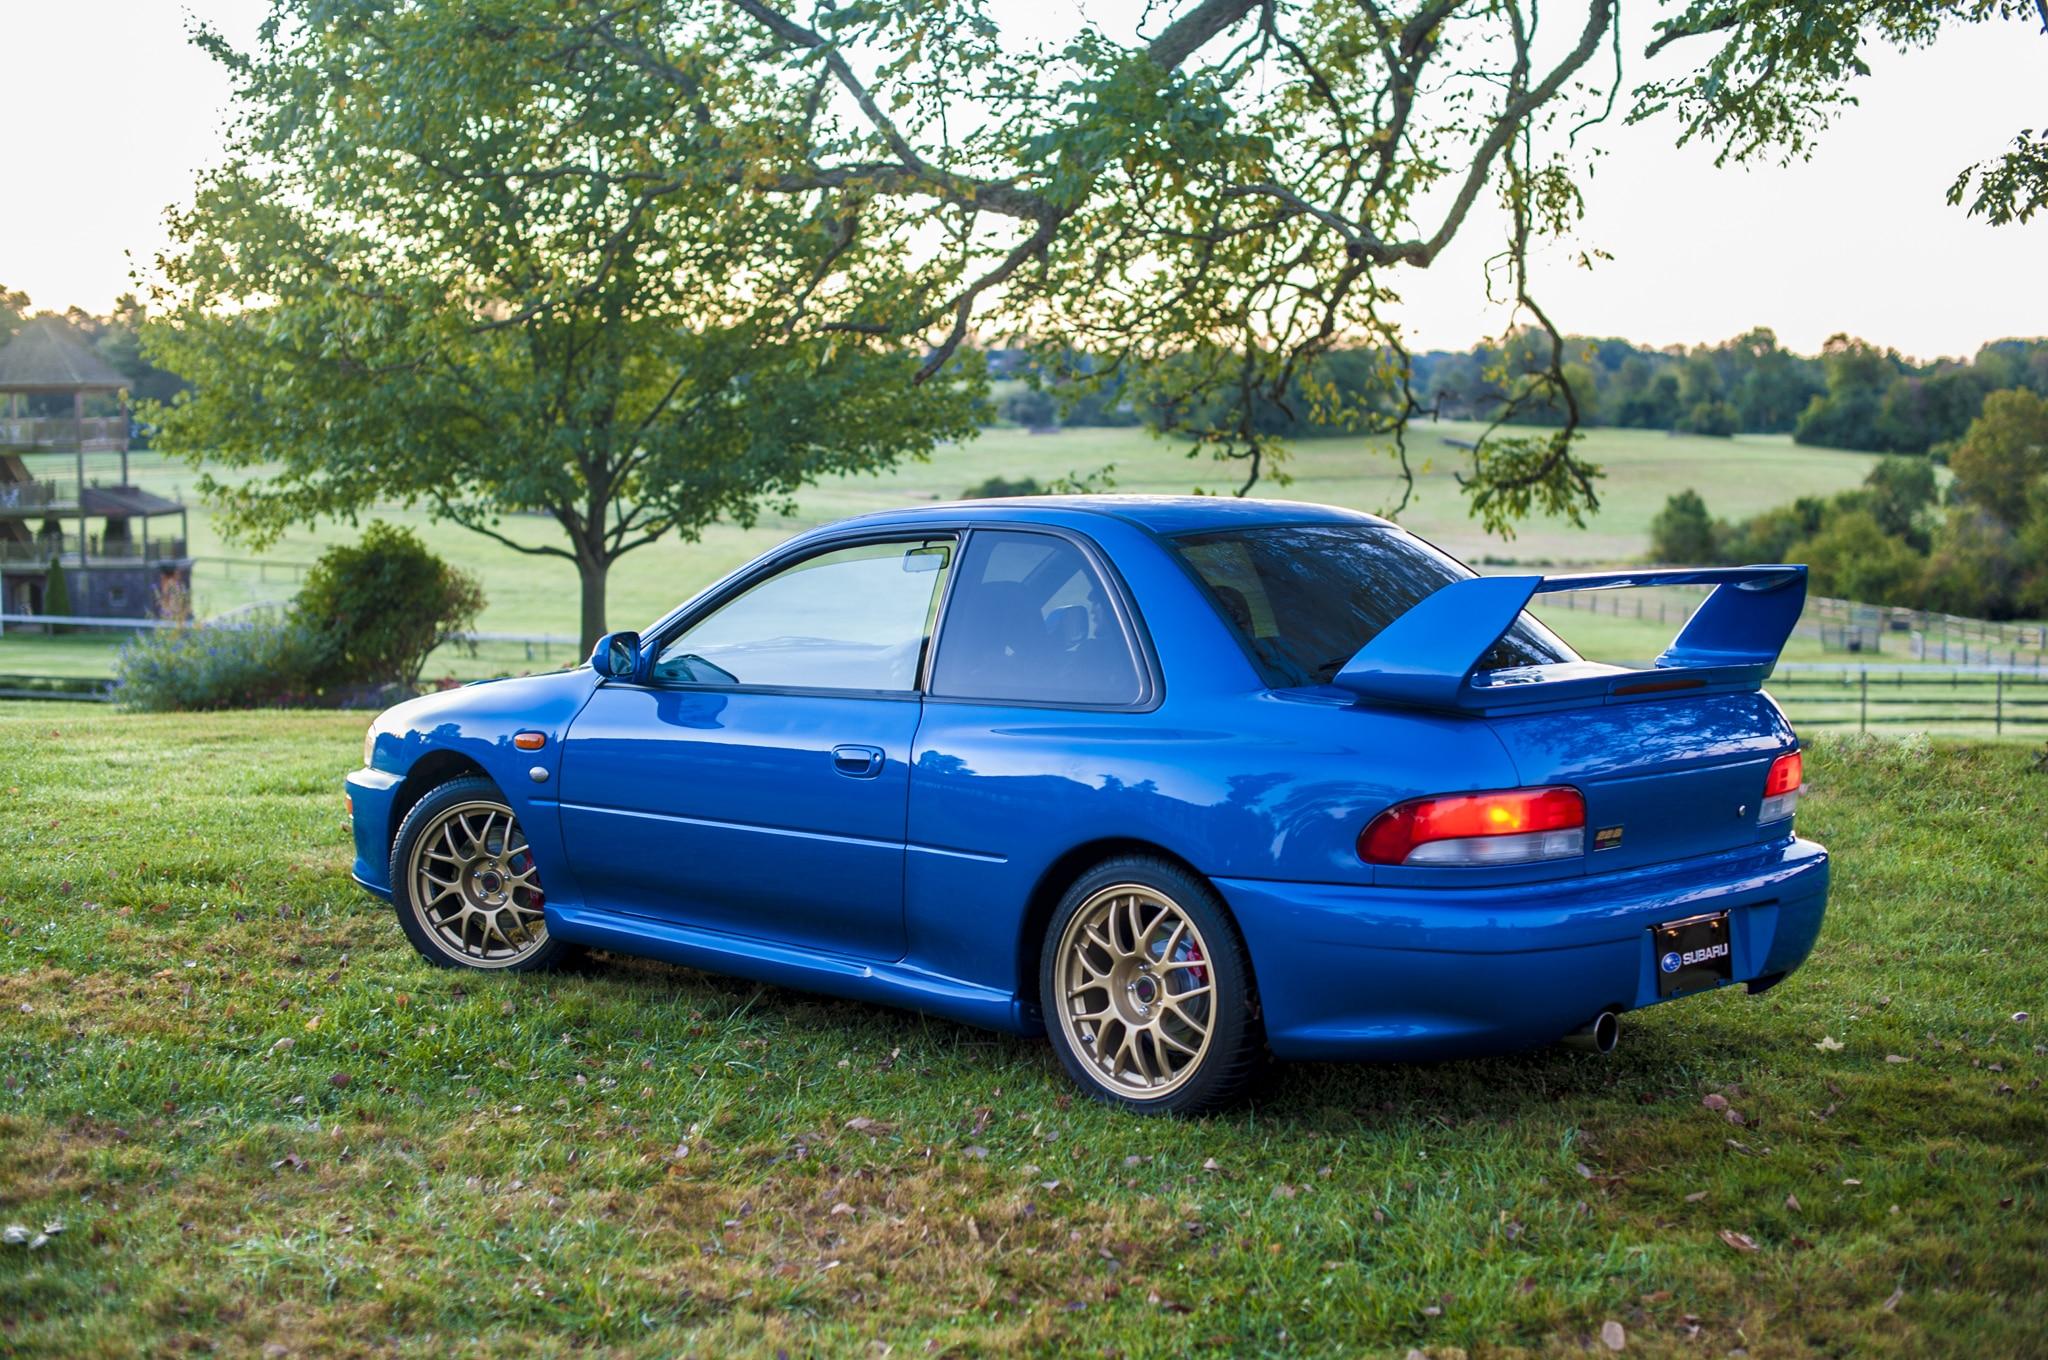 1998 Subaru Impreza 22b Sti Rear Three Quarter1